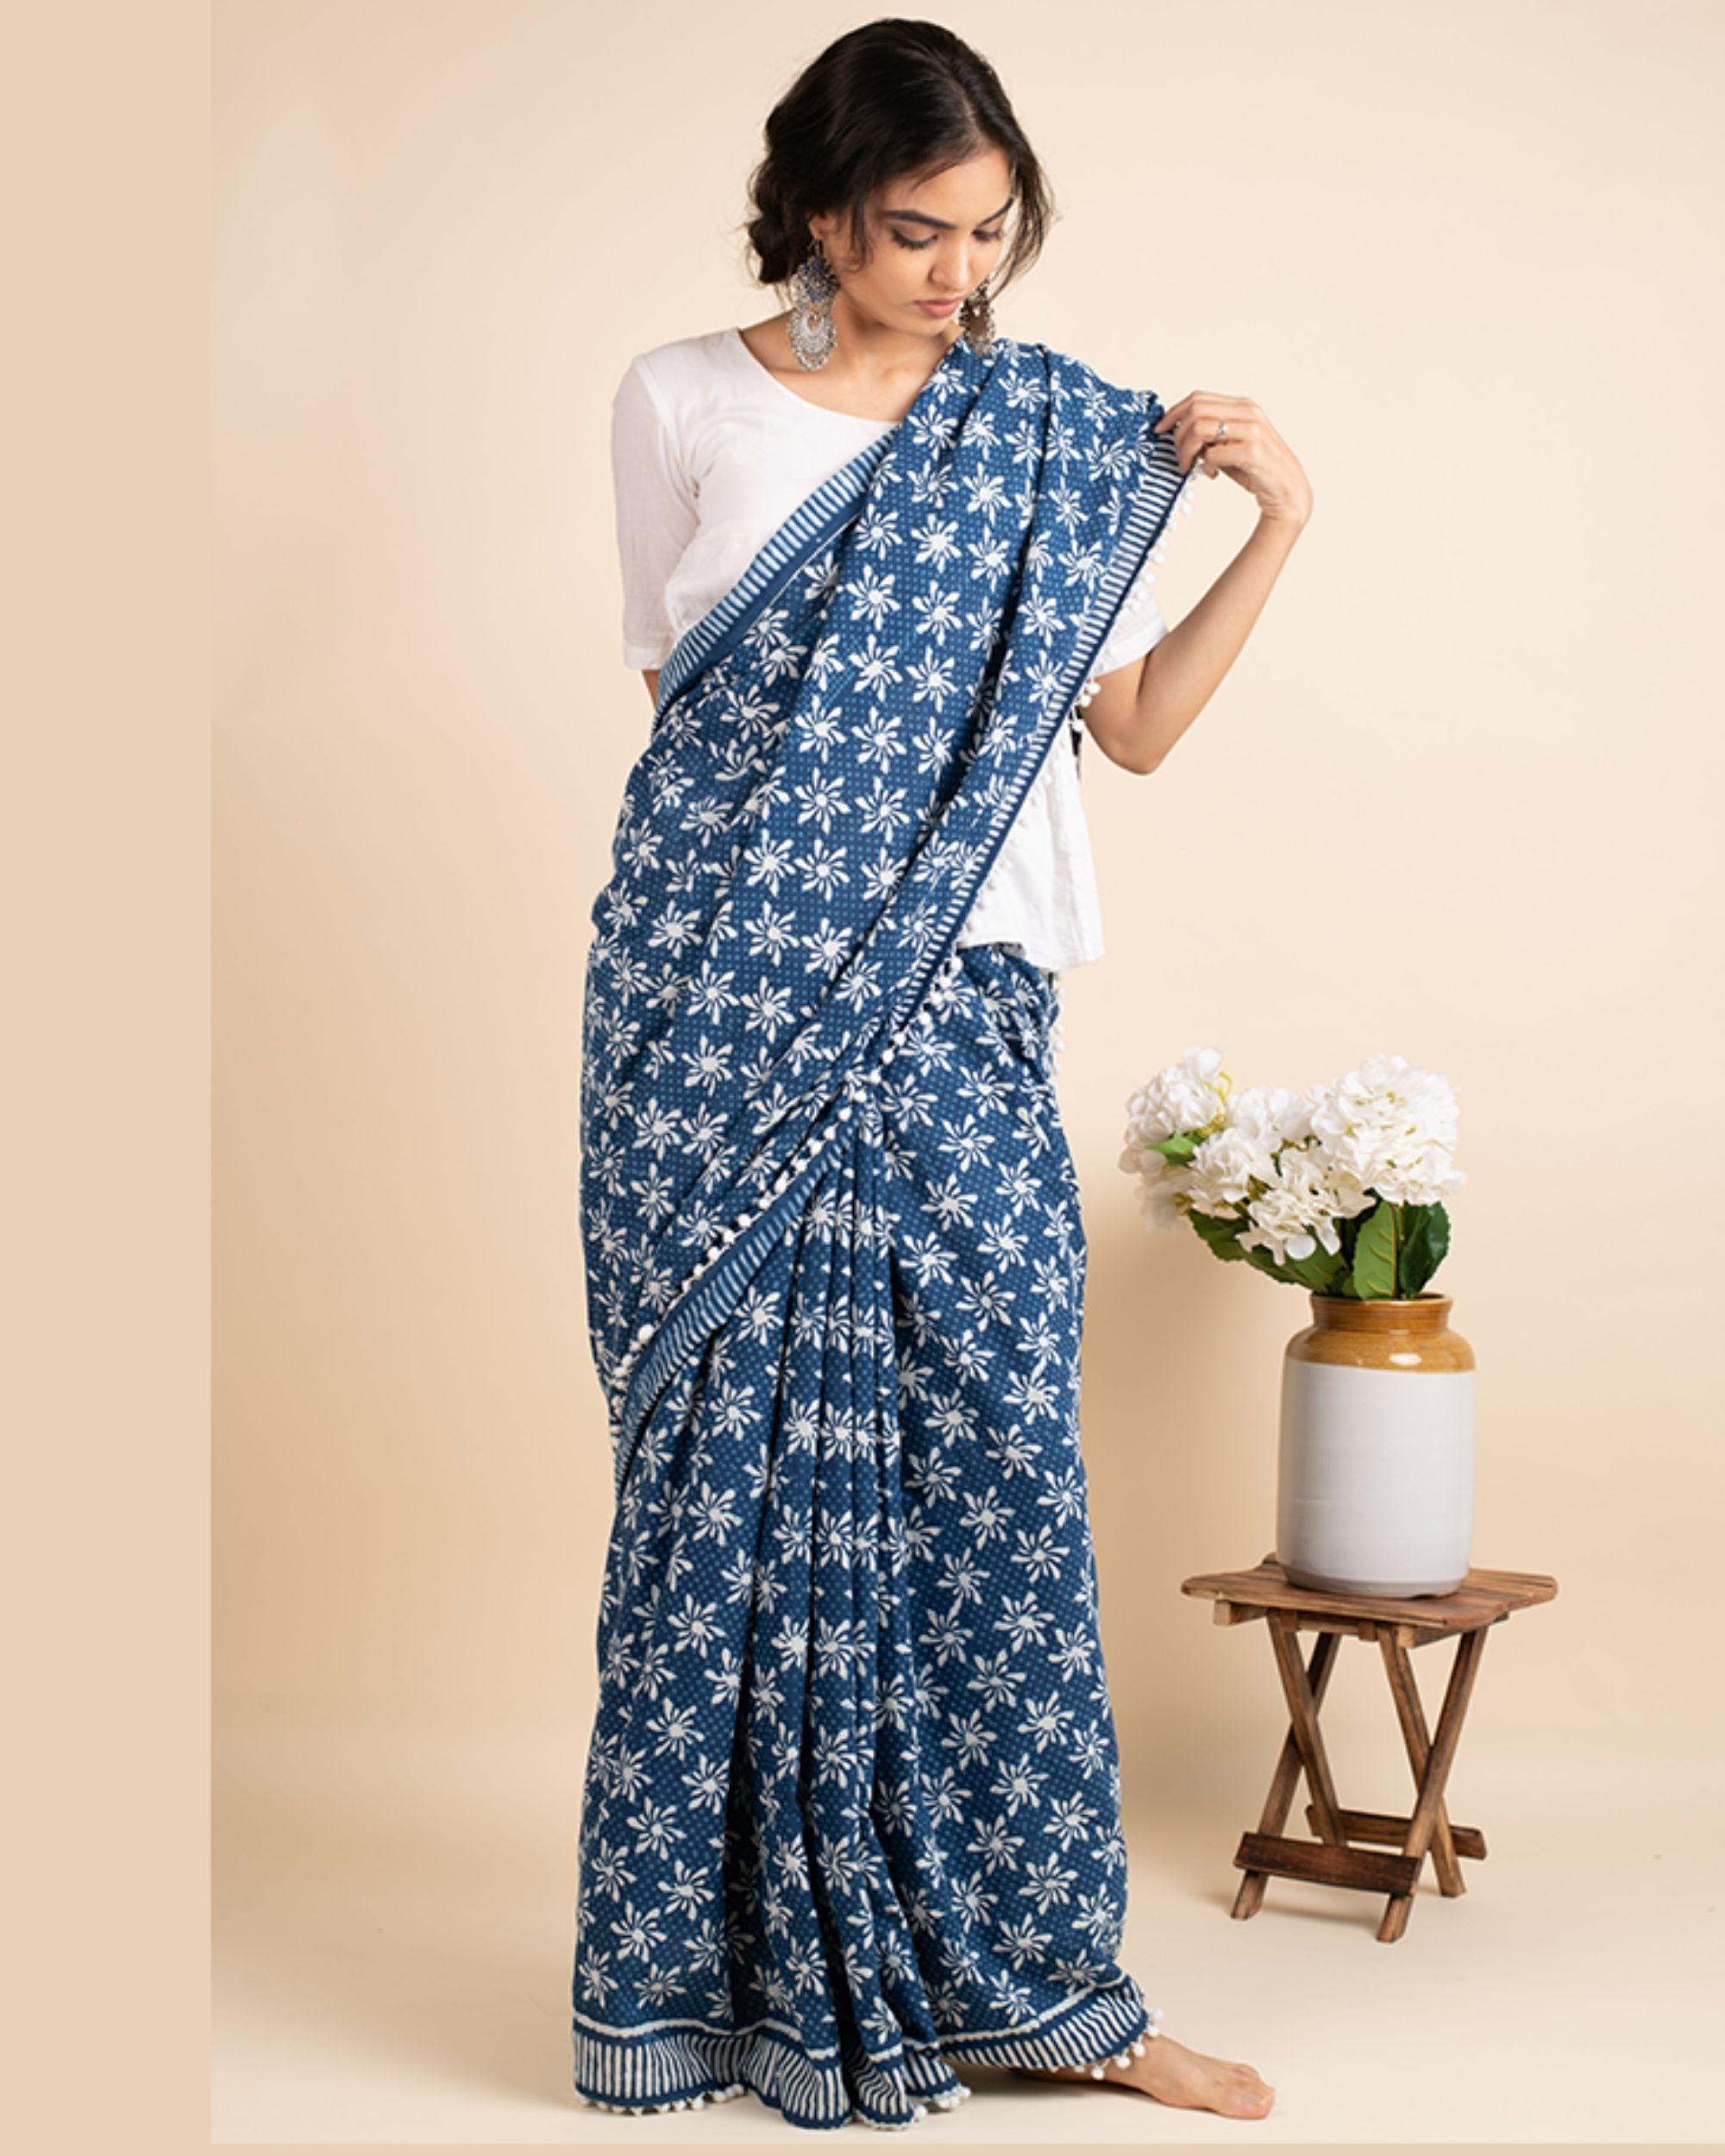 Indigo cotton lace sari with attached blouse piece